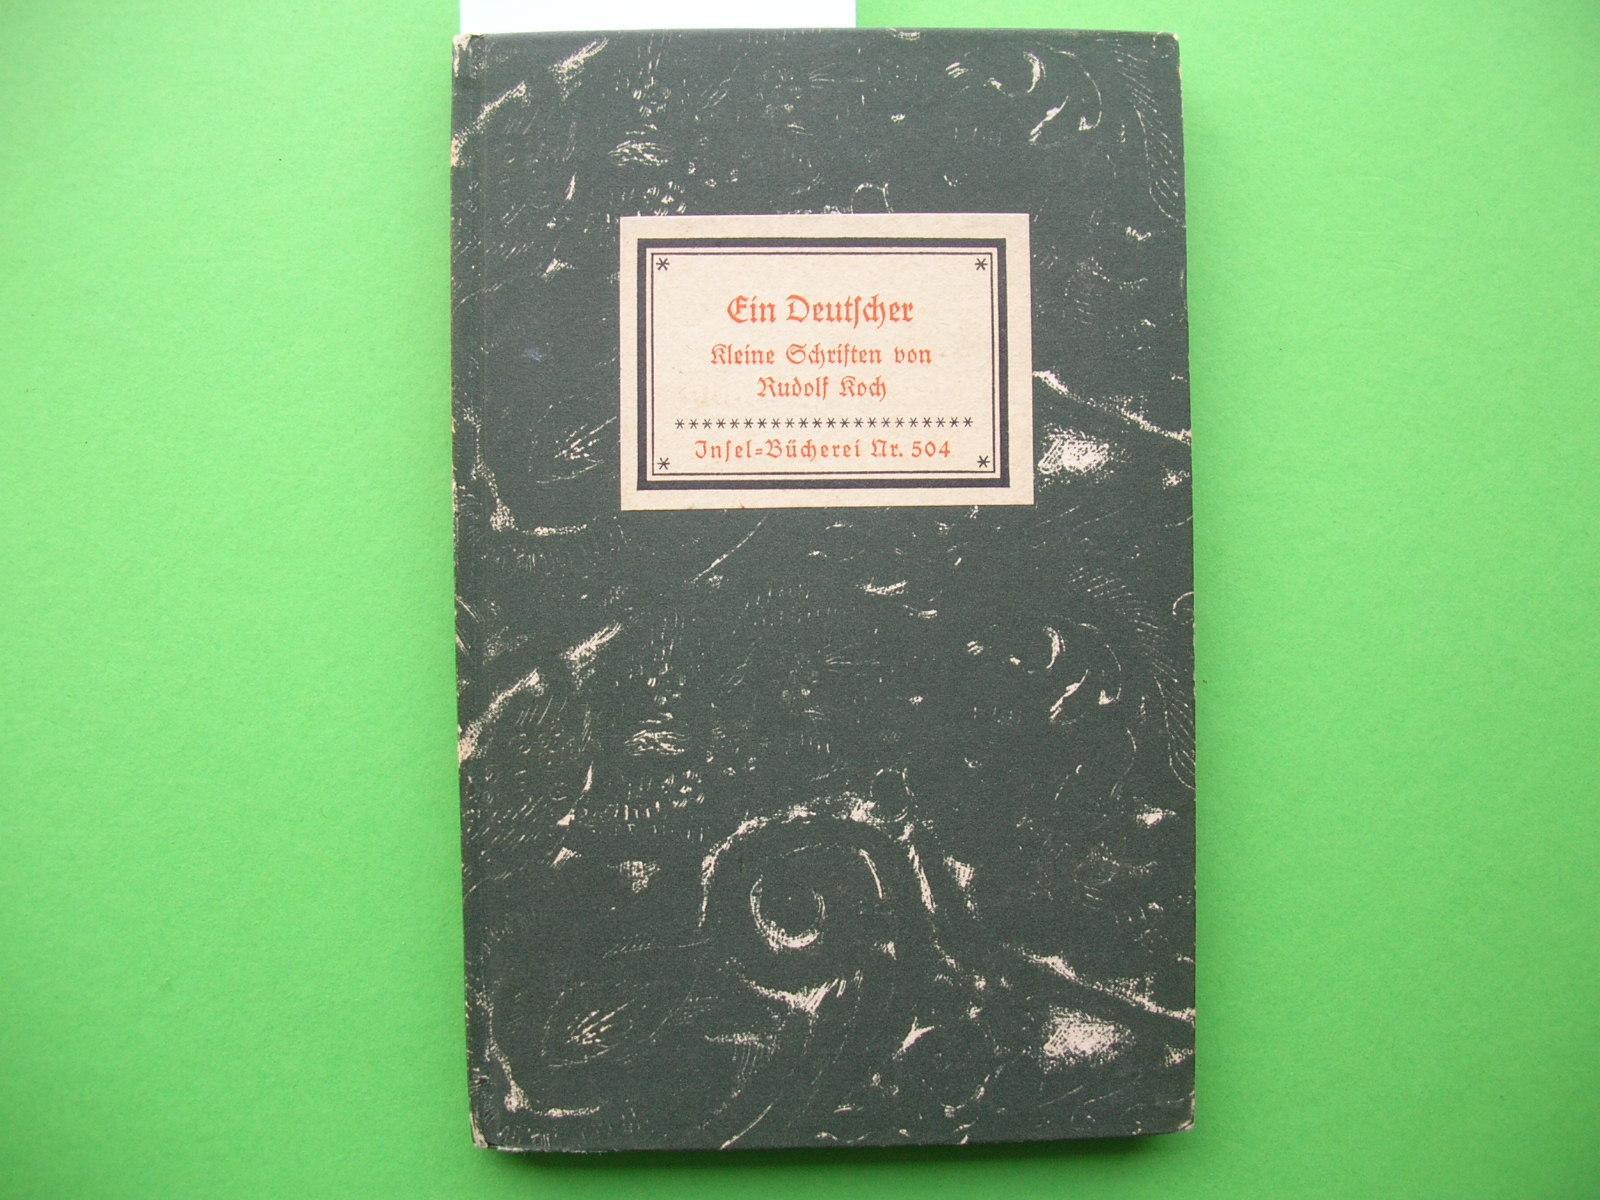 Insel-Bücherei Nr. 504: R. Koch: Ein